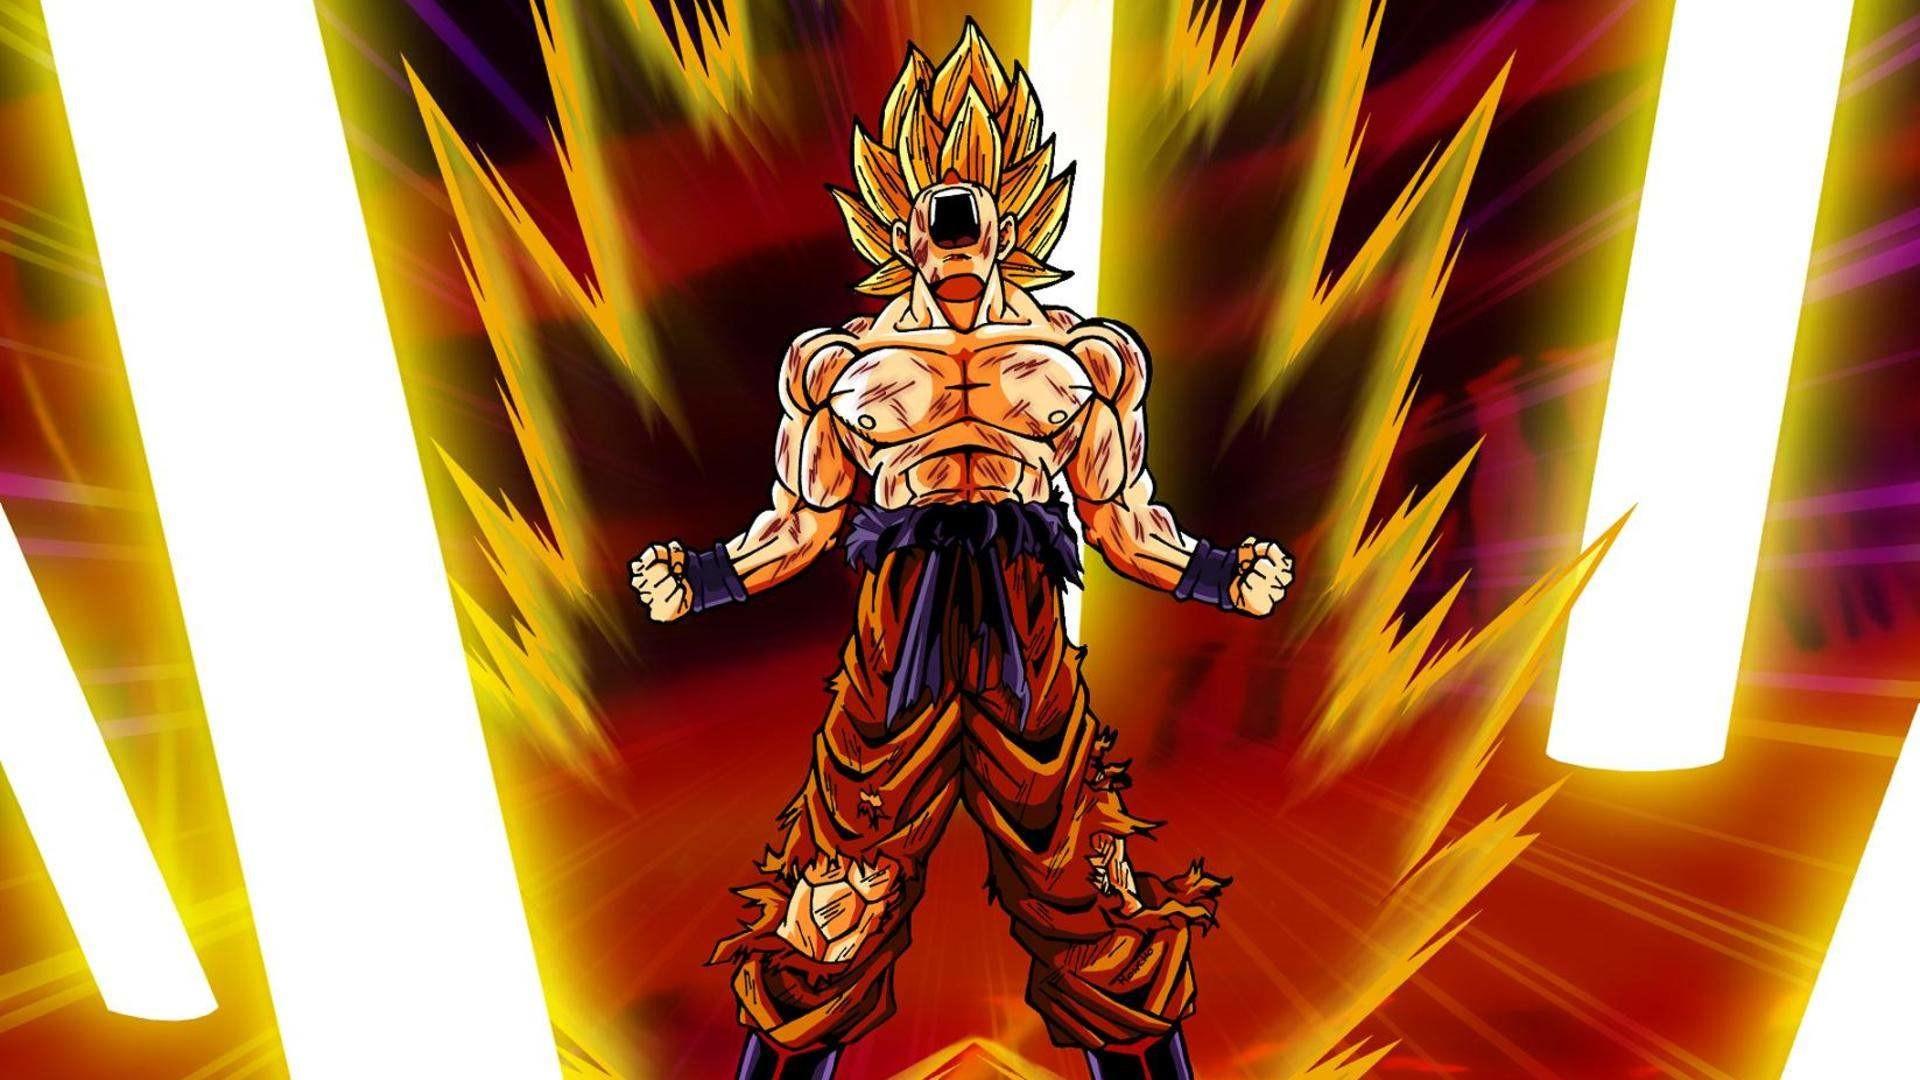 Dragon Ball Z Goku Super Saiyan 183 Hd Wallpapers in Cartoons .